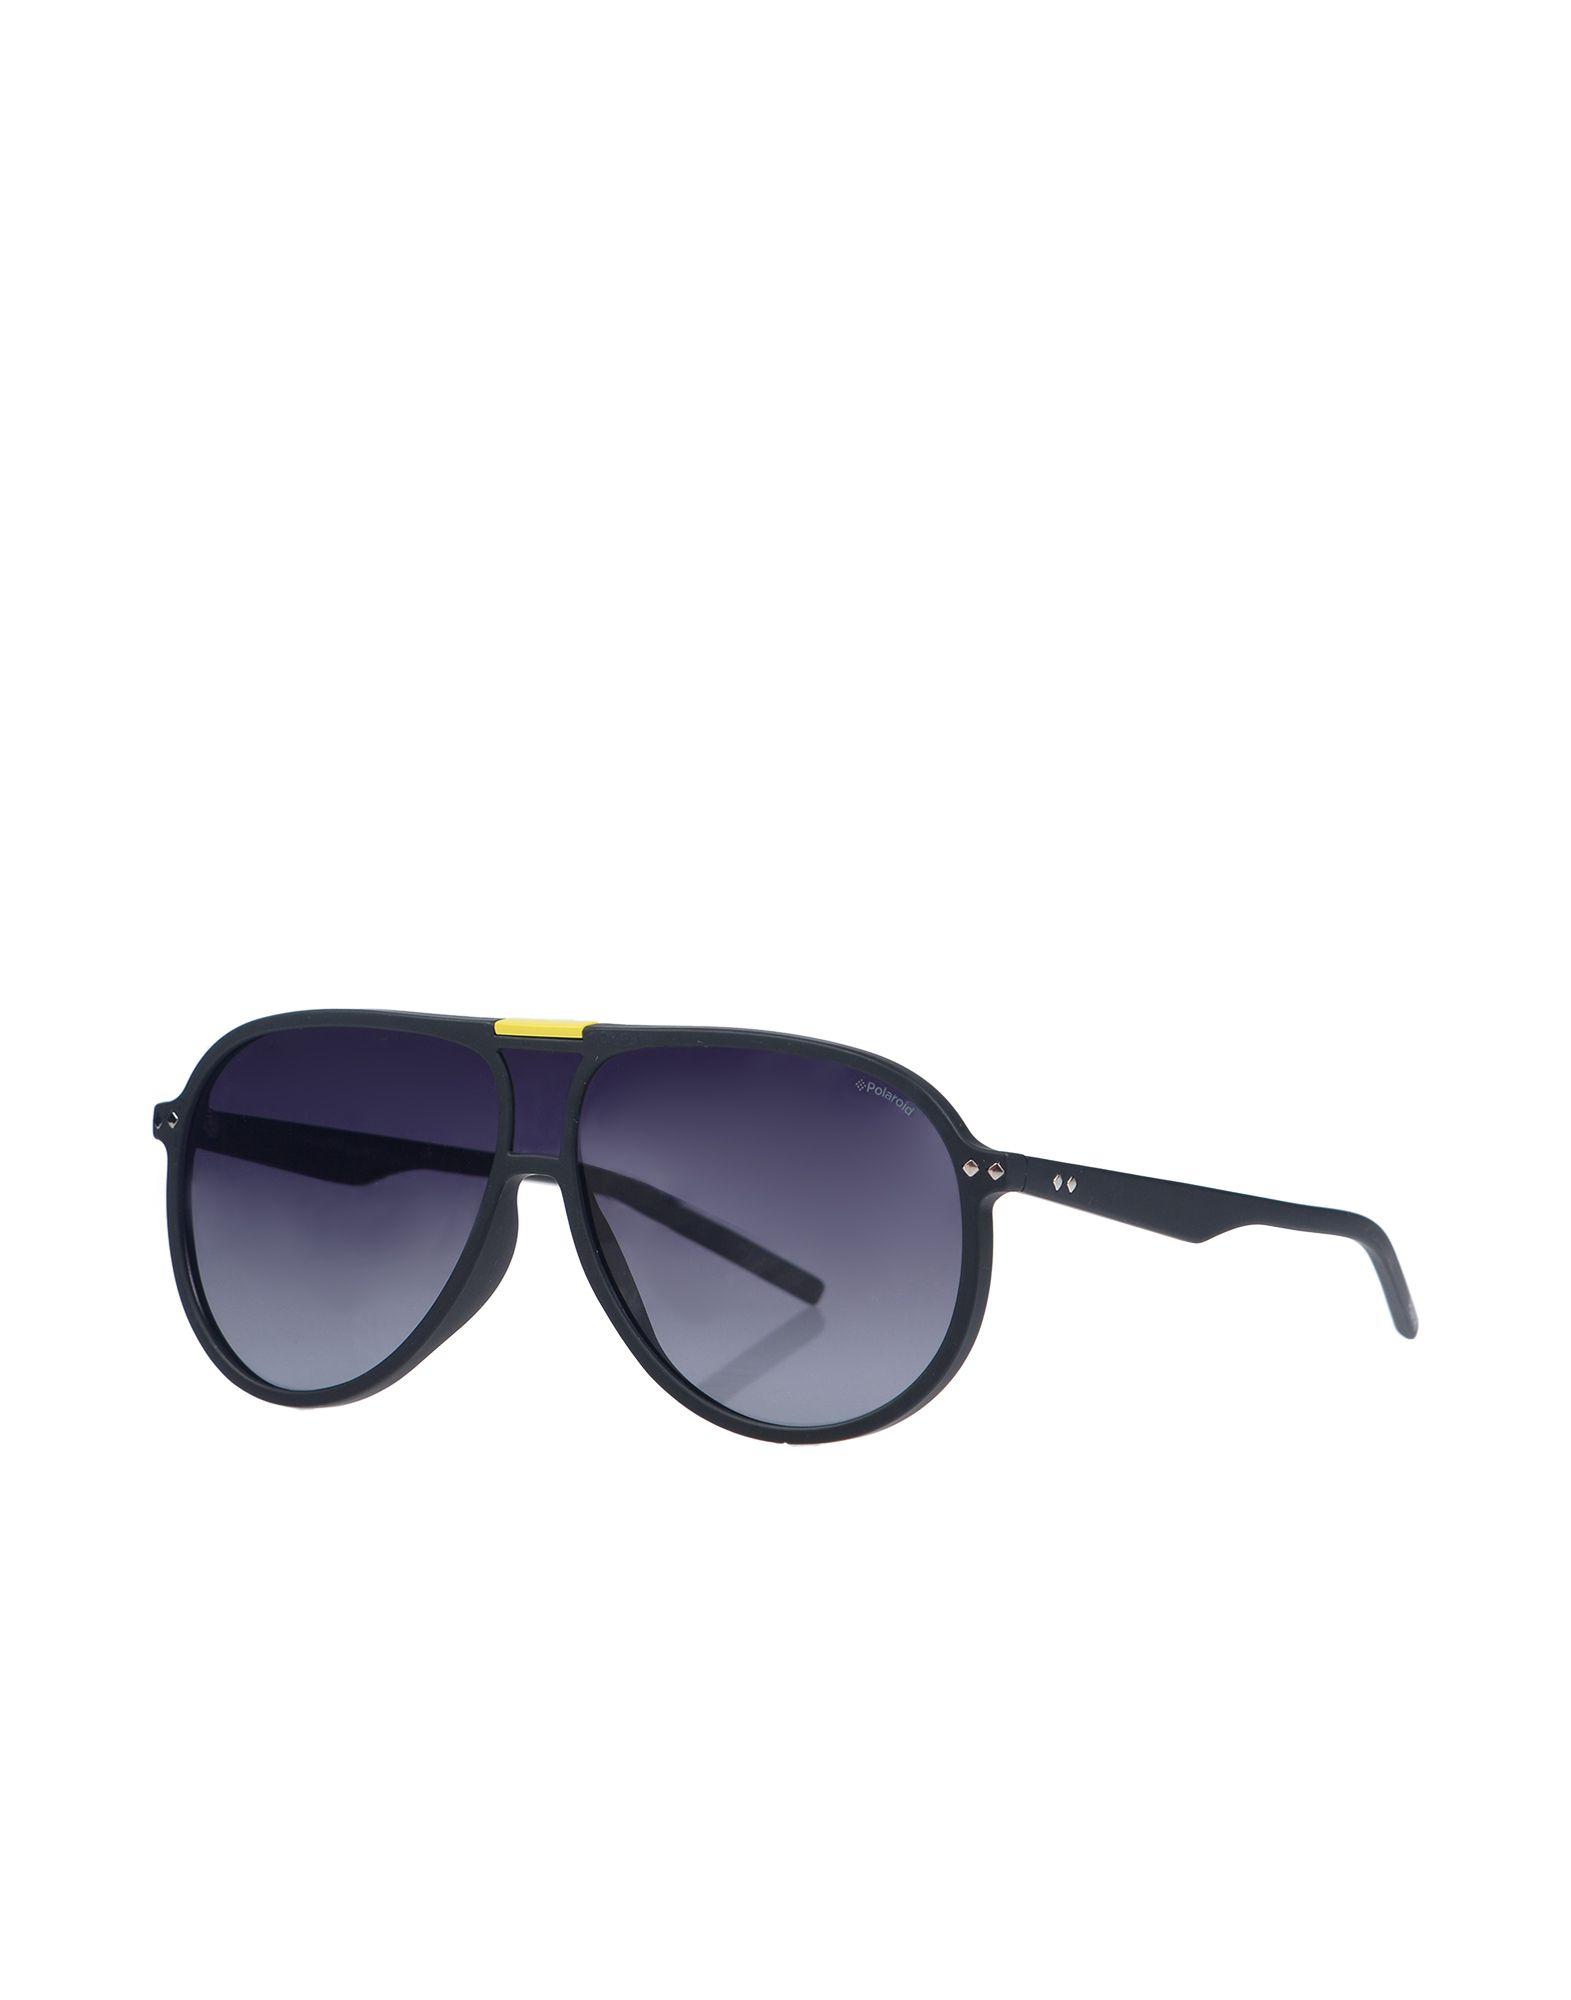 POLAROID Солнечные очки dkny солнечные очки